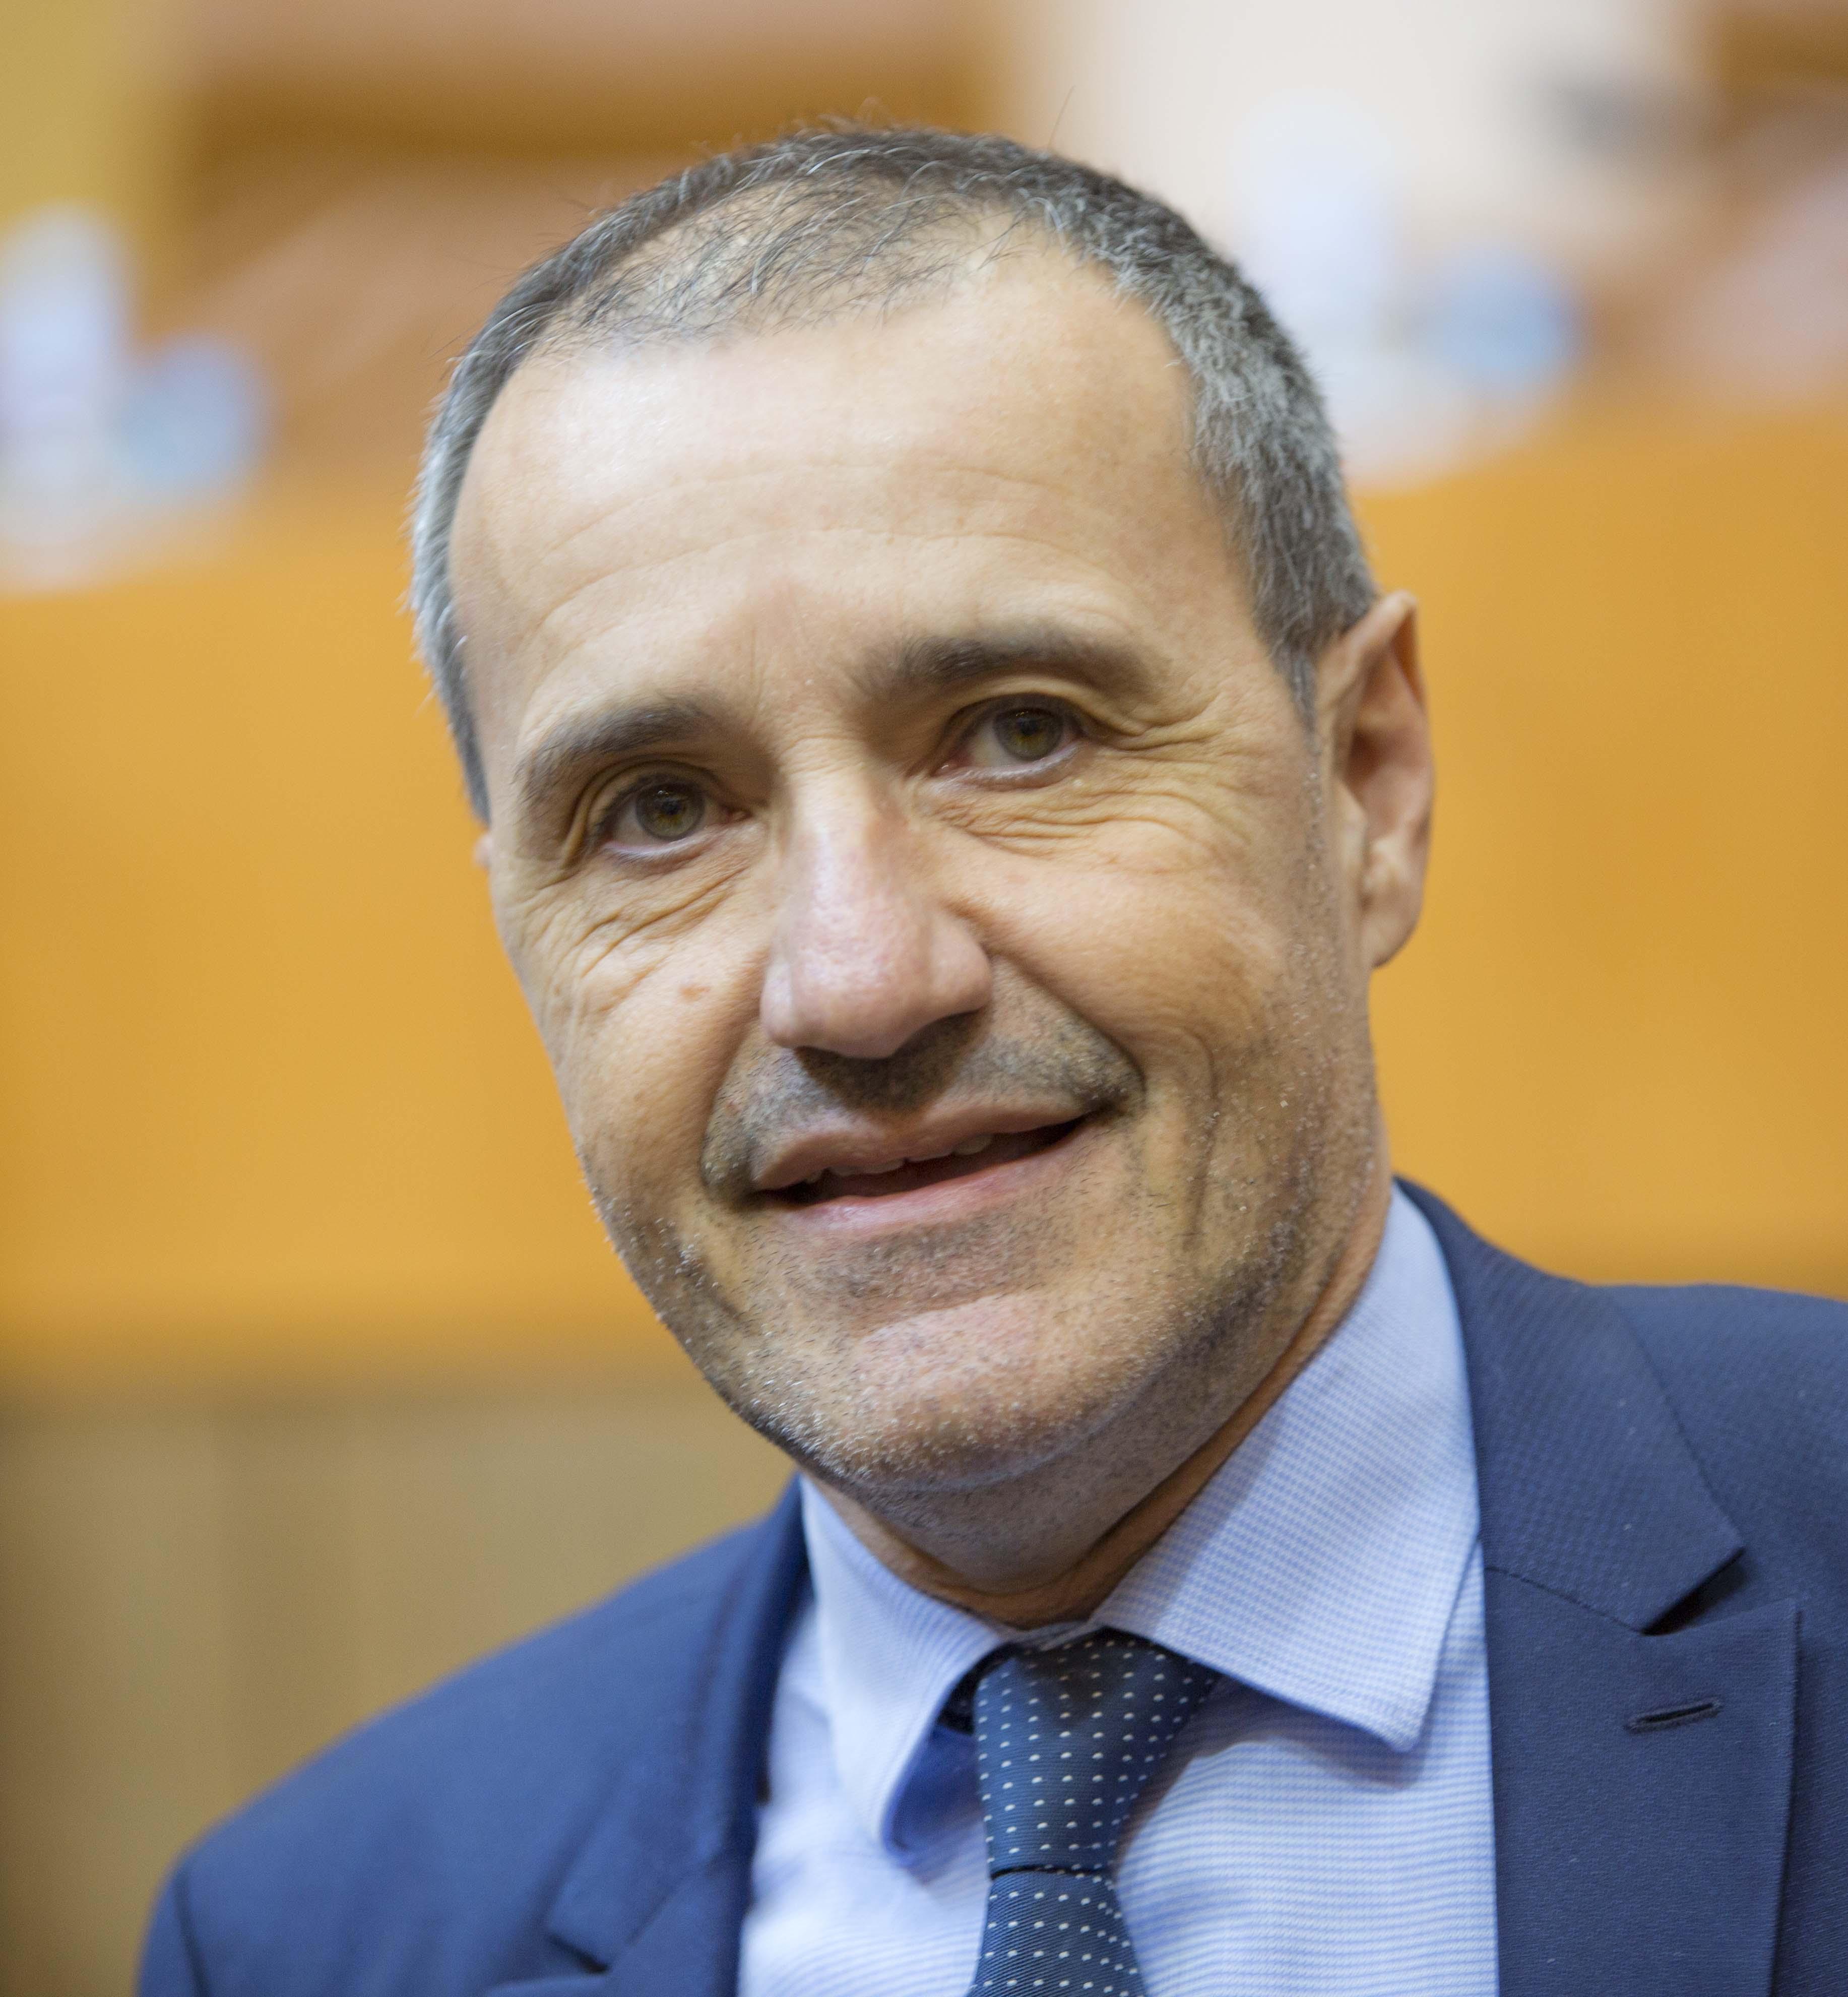 Séance publique de l'Assemblée de Corse des 30 et 31 mai 2018 - discorsu di u Presidente di l'Assemblea di Corsica